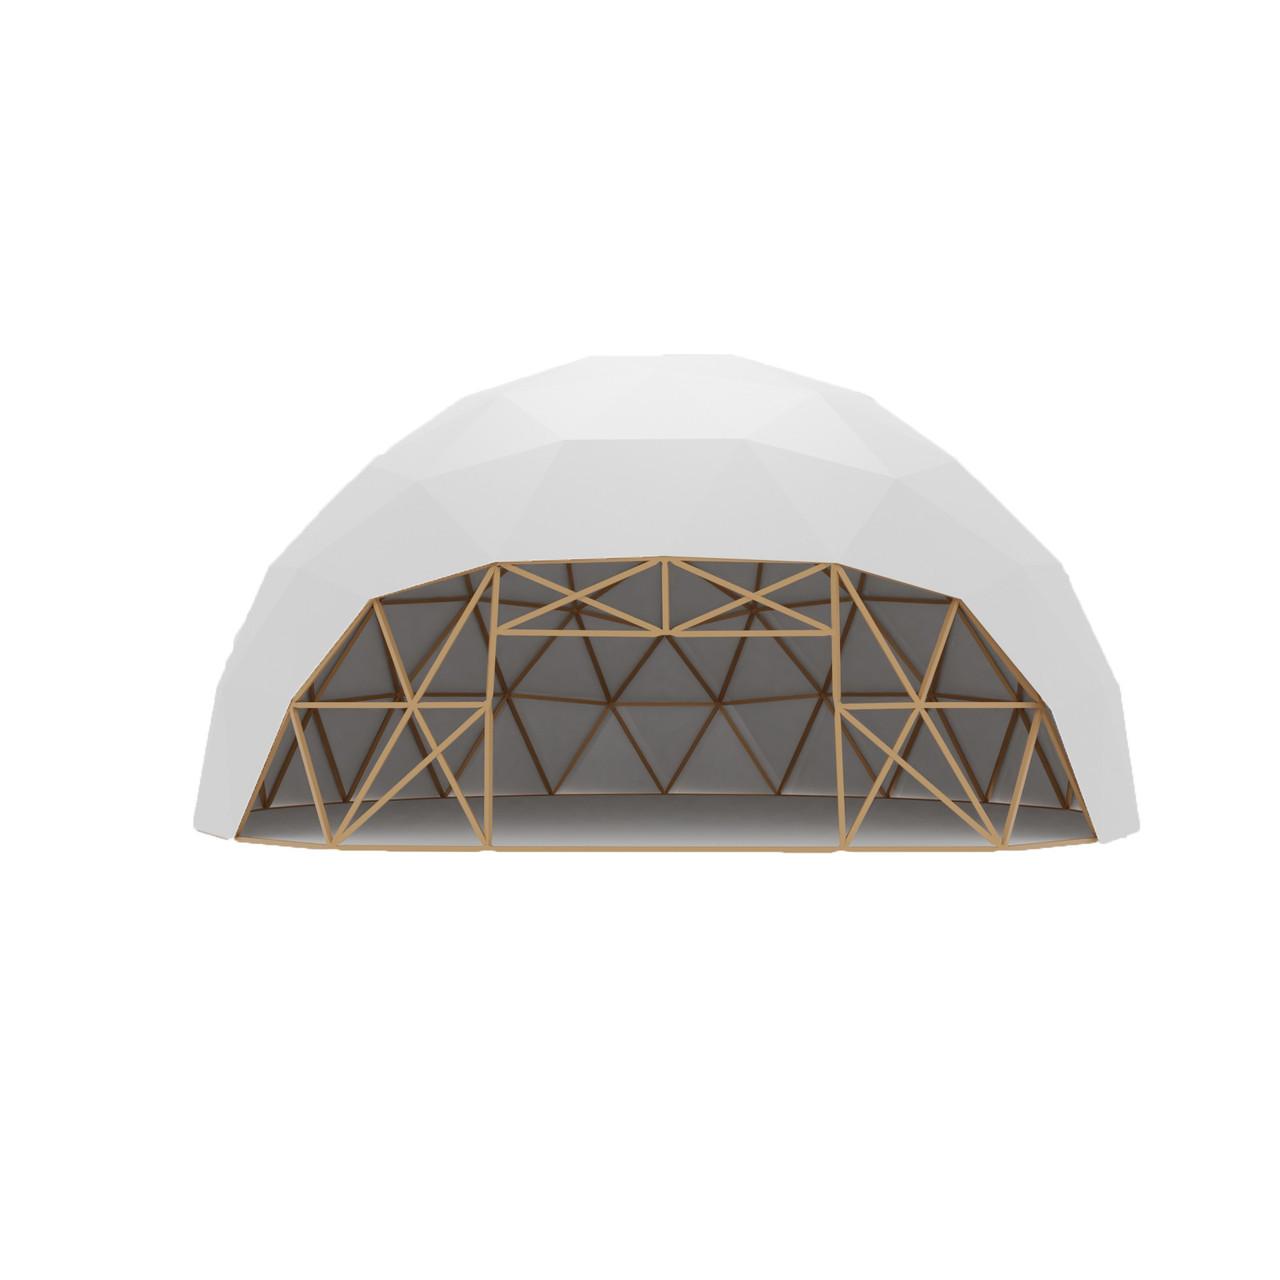 Сферический шатер диаметр 9 м